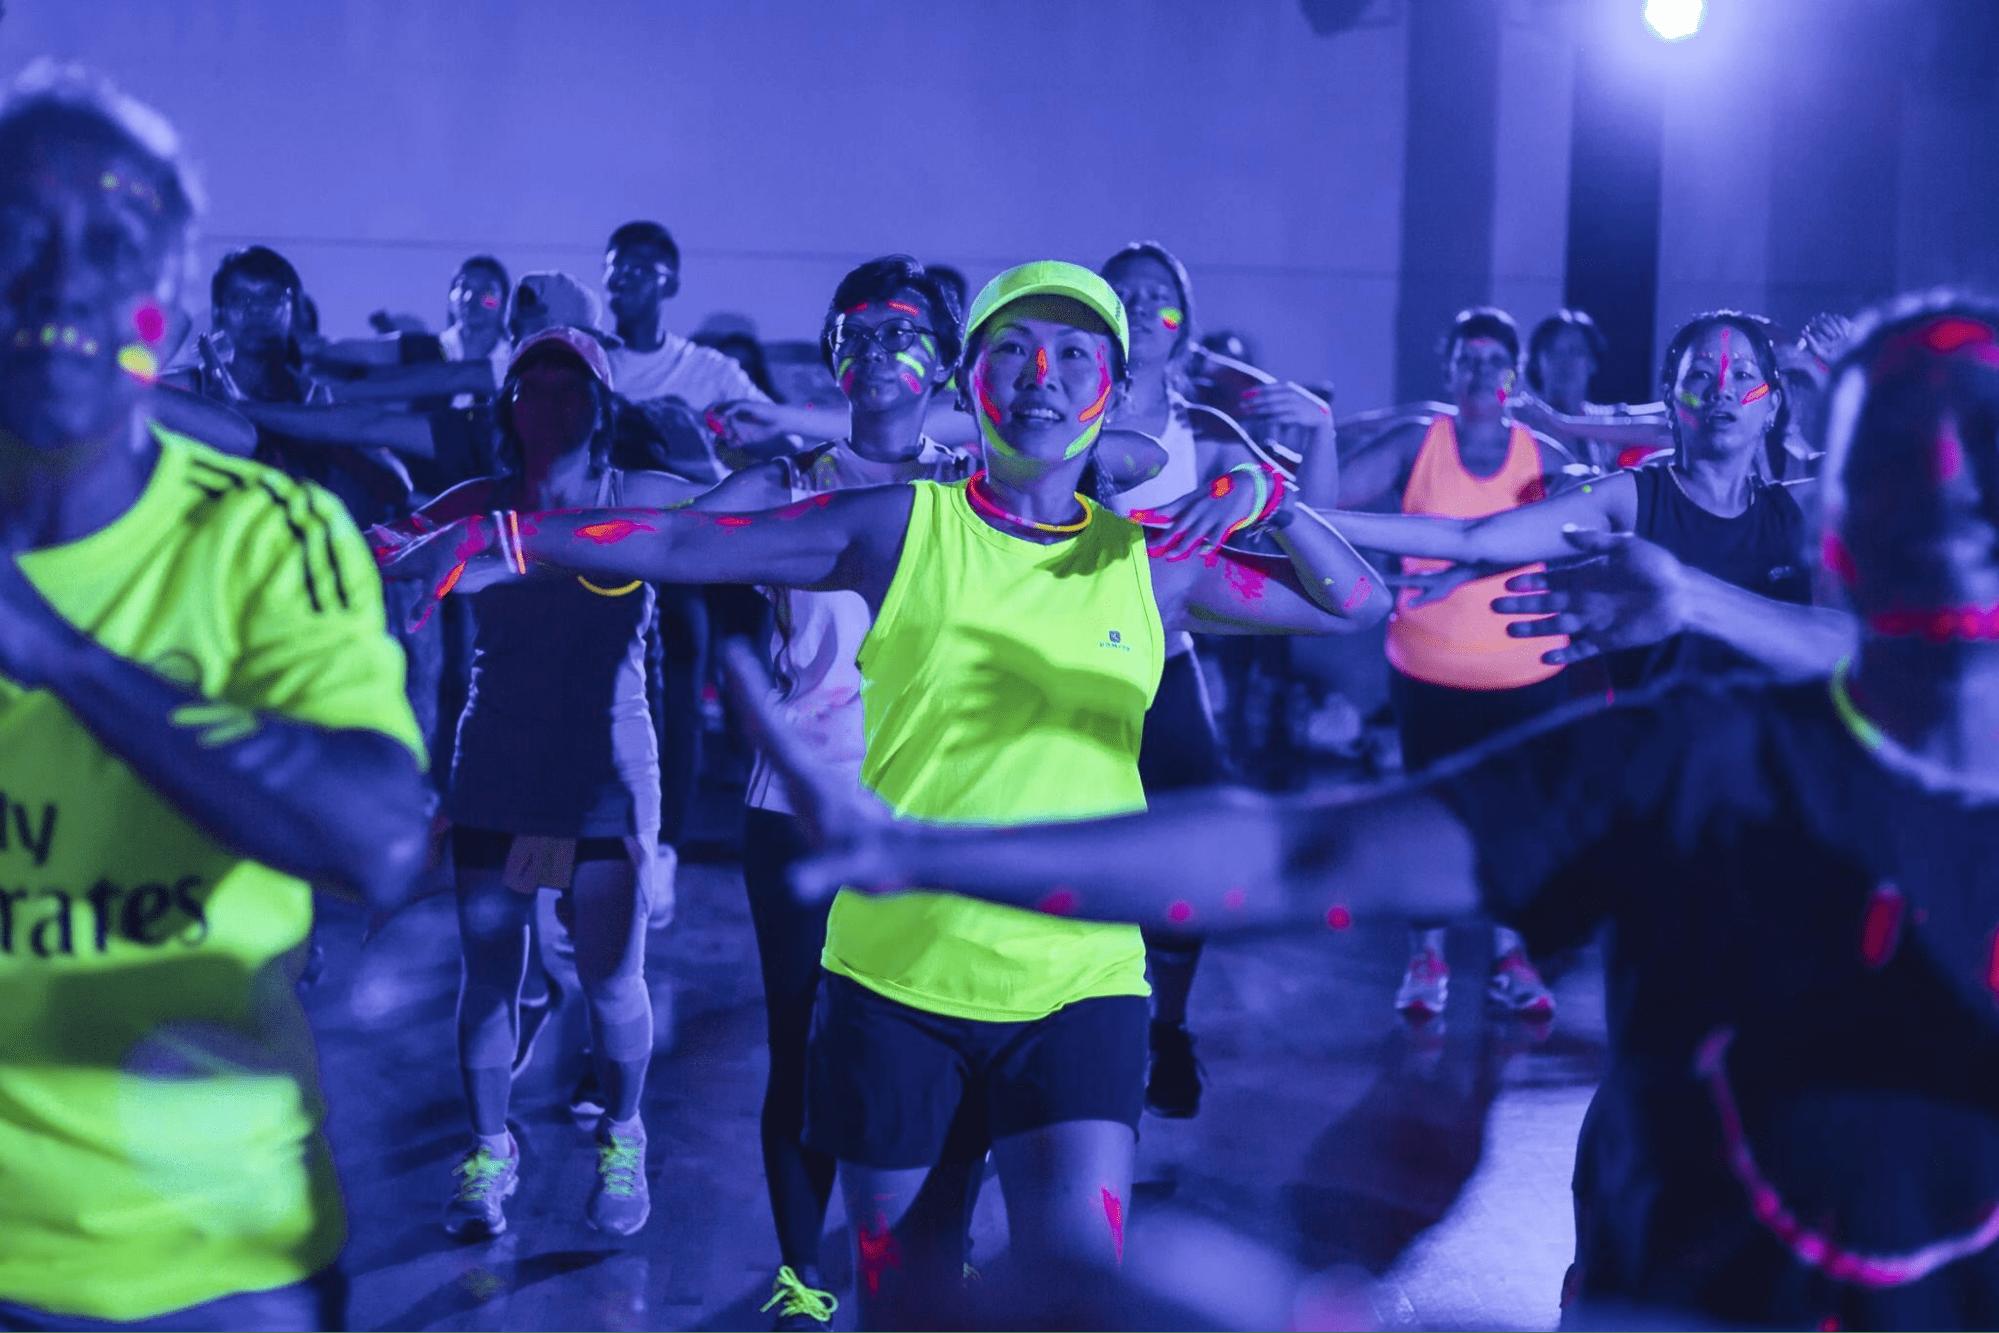 Singapore Sports Hub Summer Sports Jam Glow Dance Jam